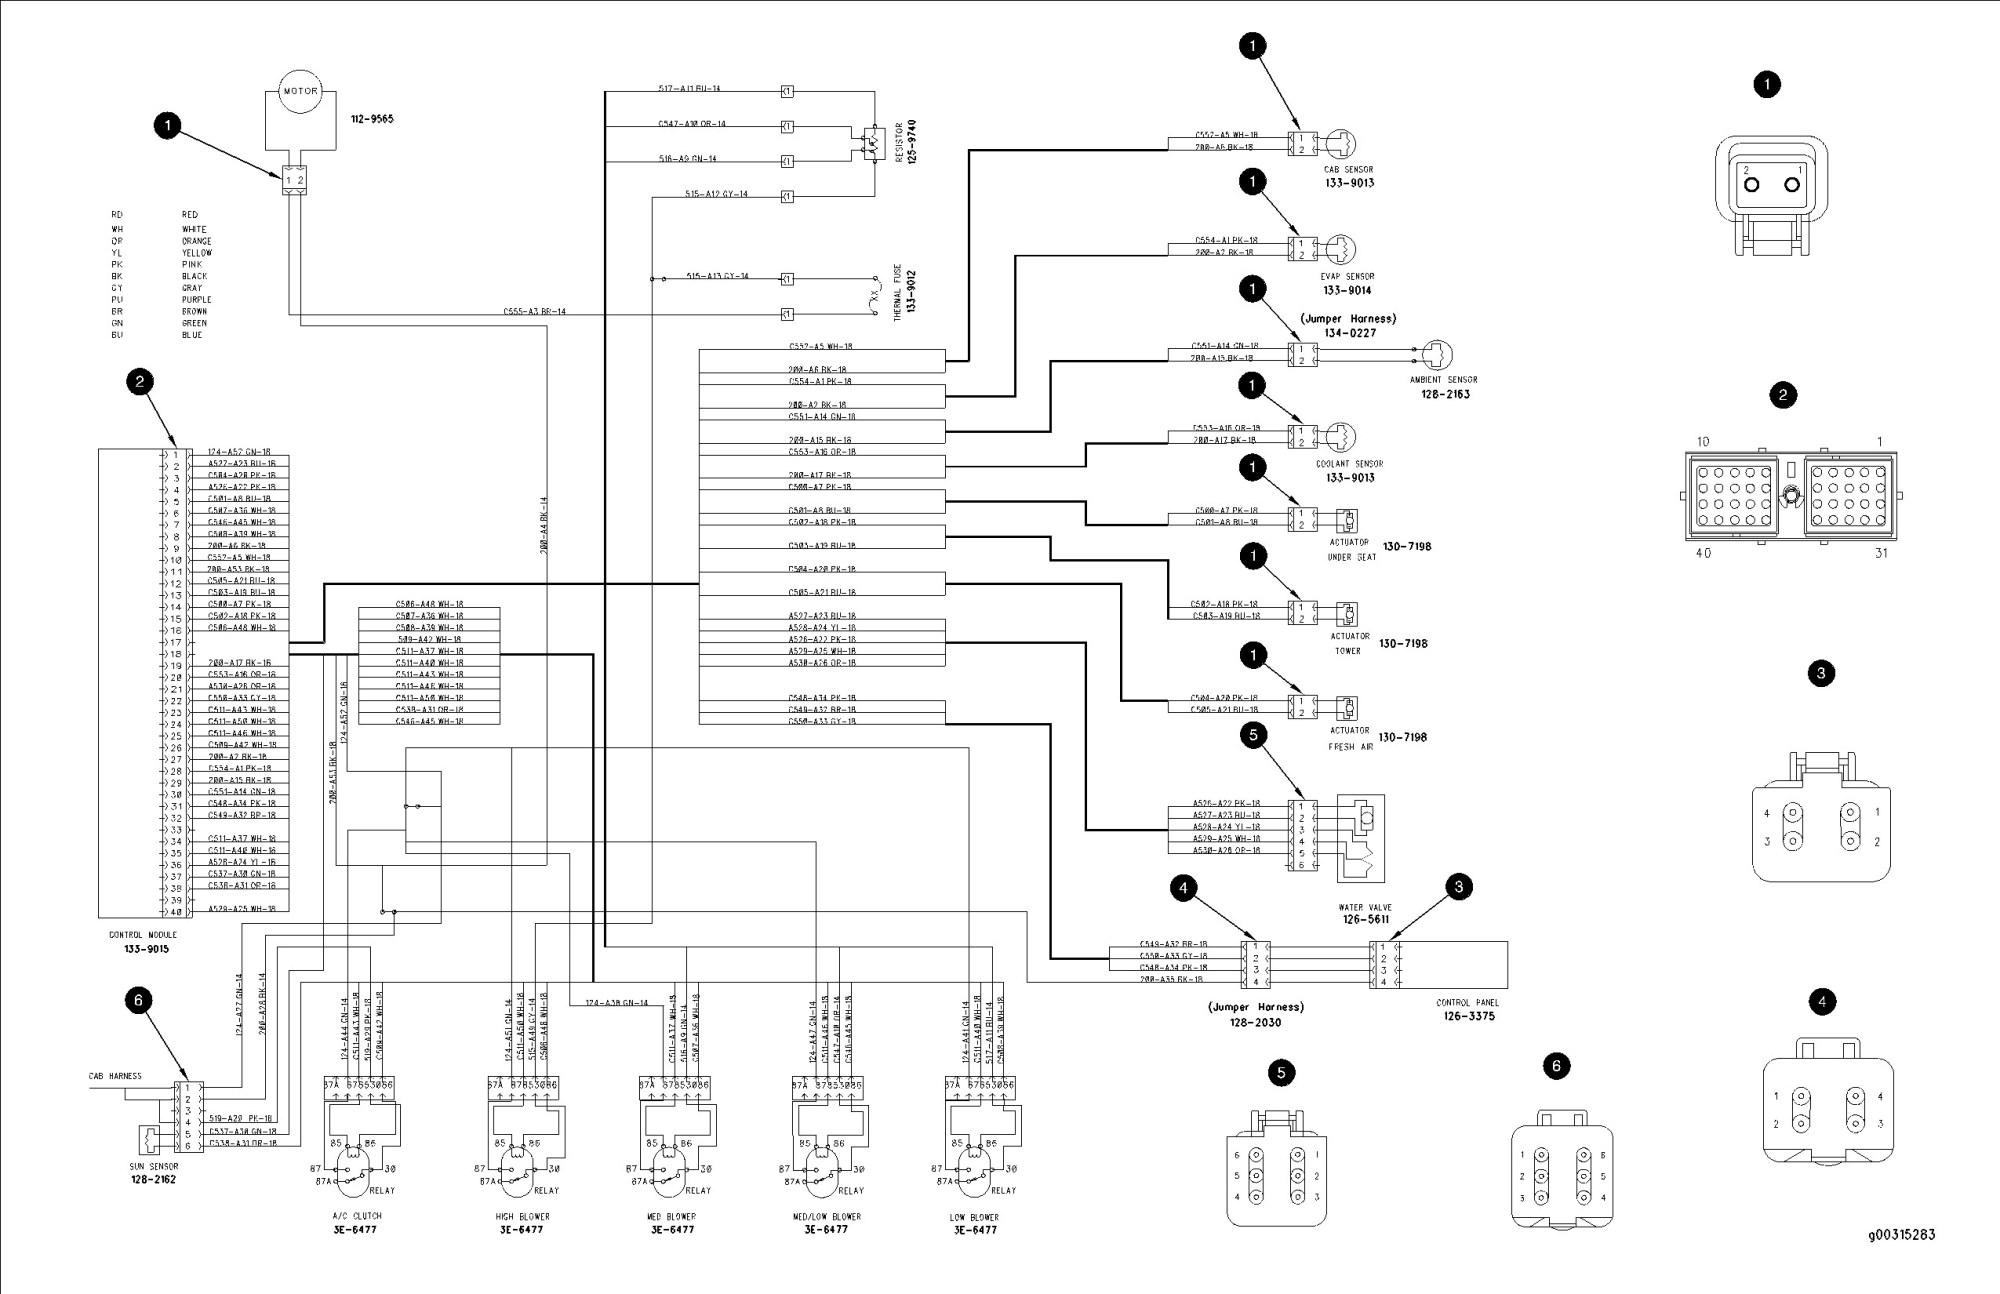 hight resolution of bass tracker wiring schematic wiring diagram bass tracker new diagram 2010 bass tracker wiring diagram